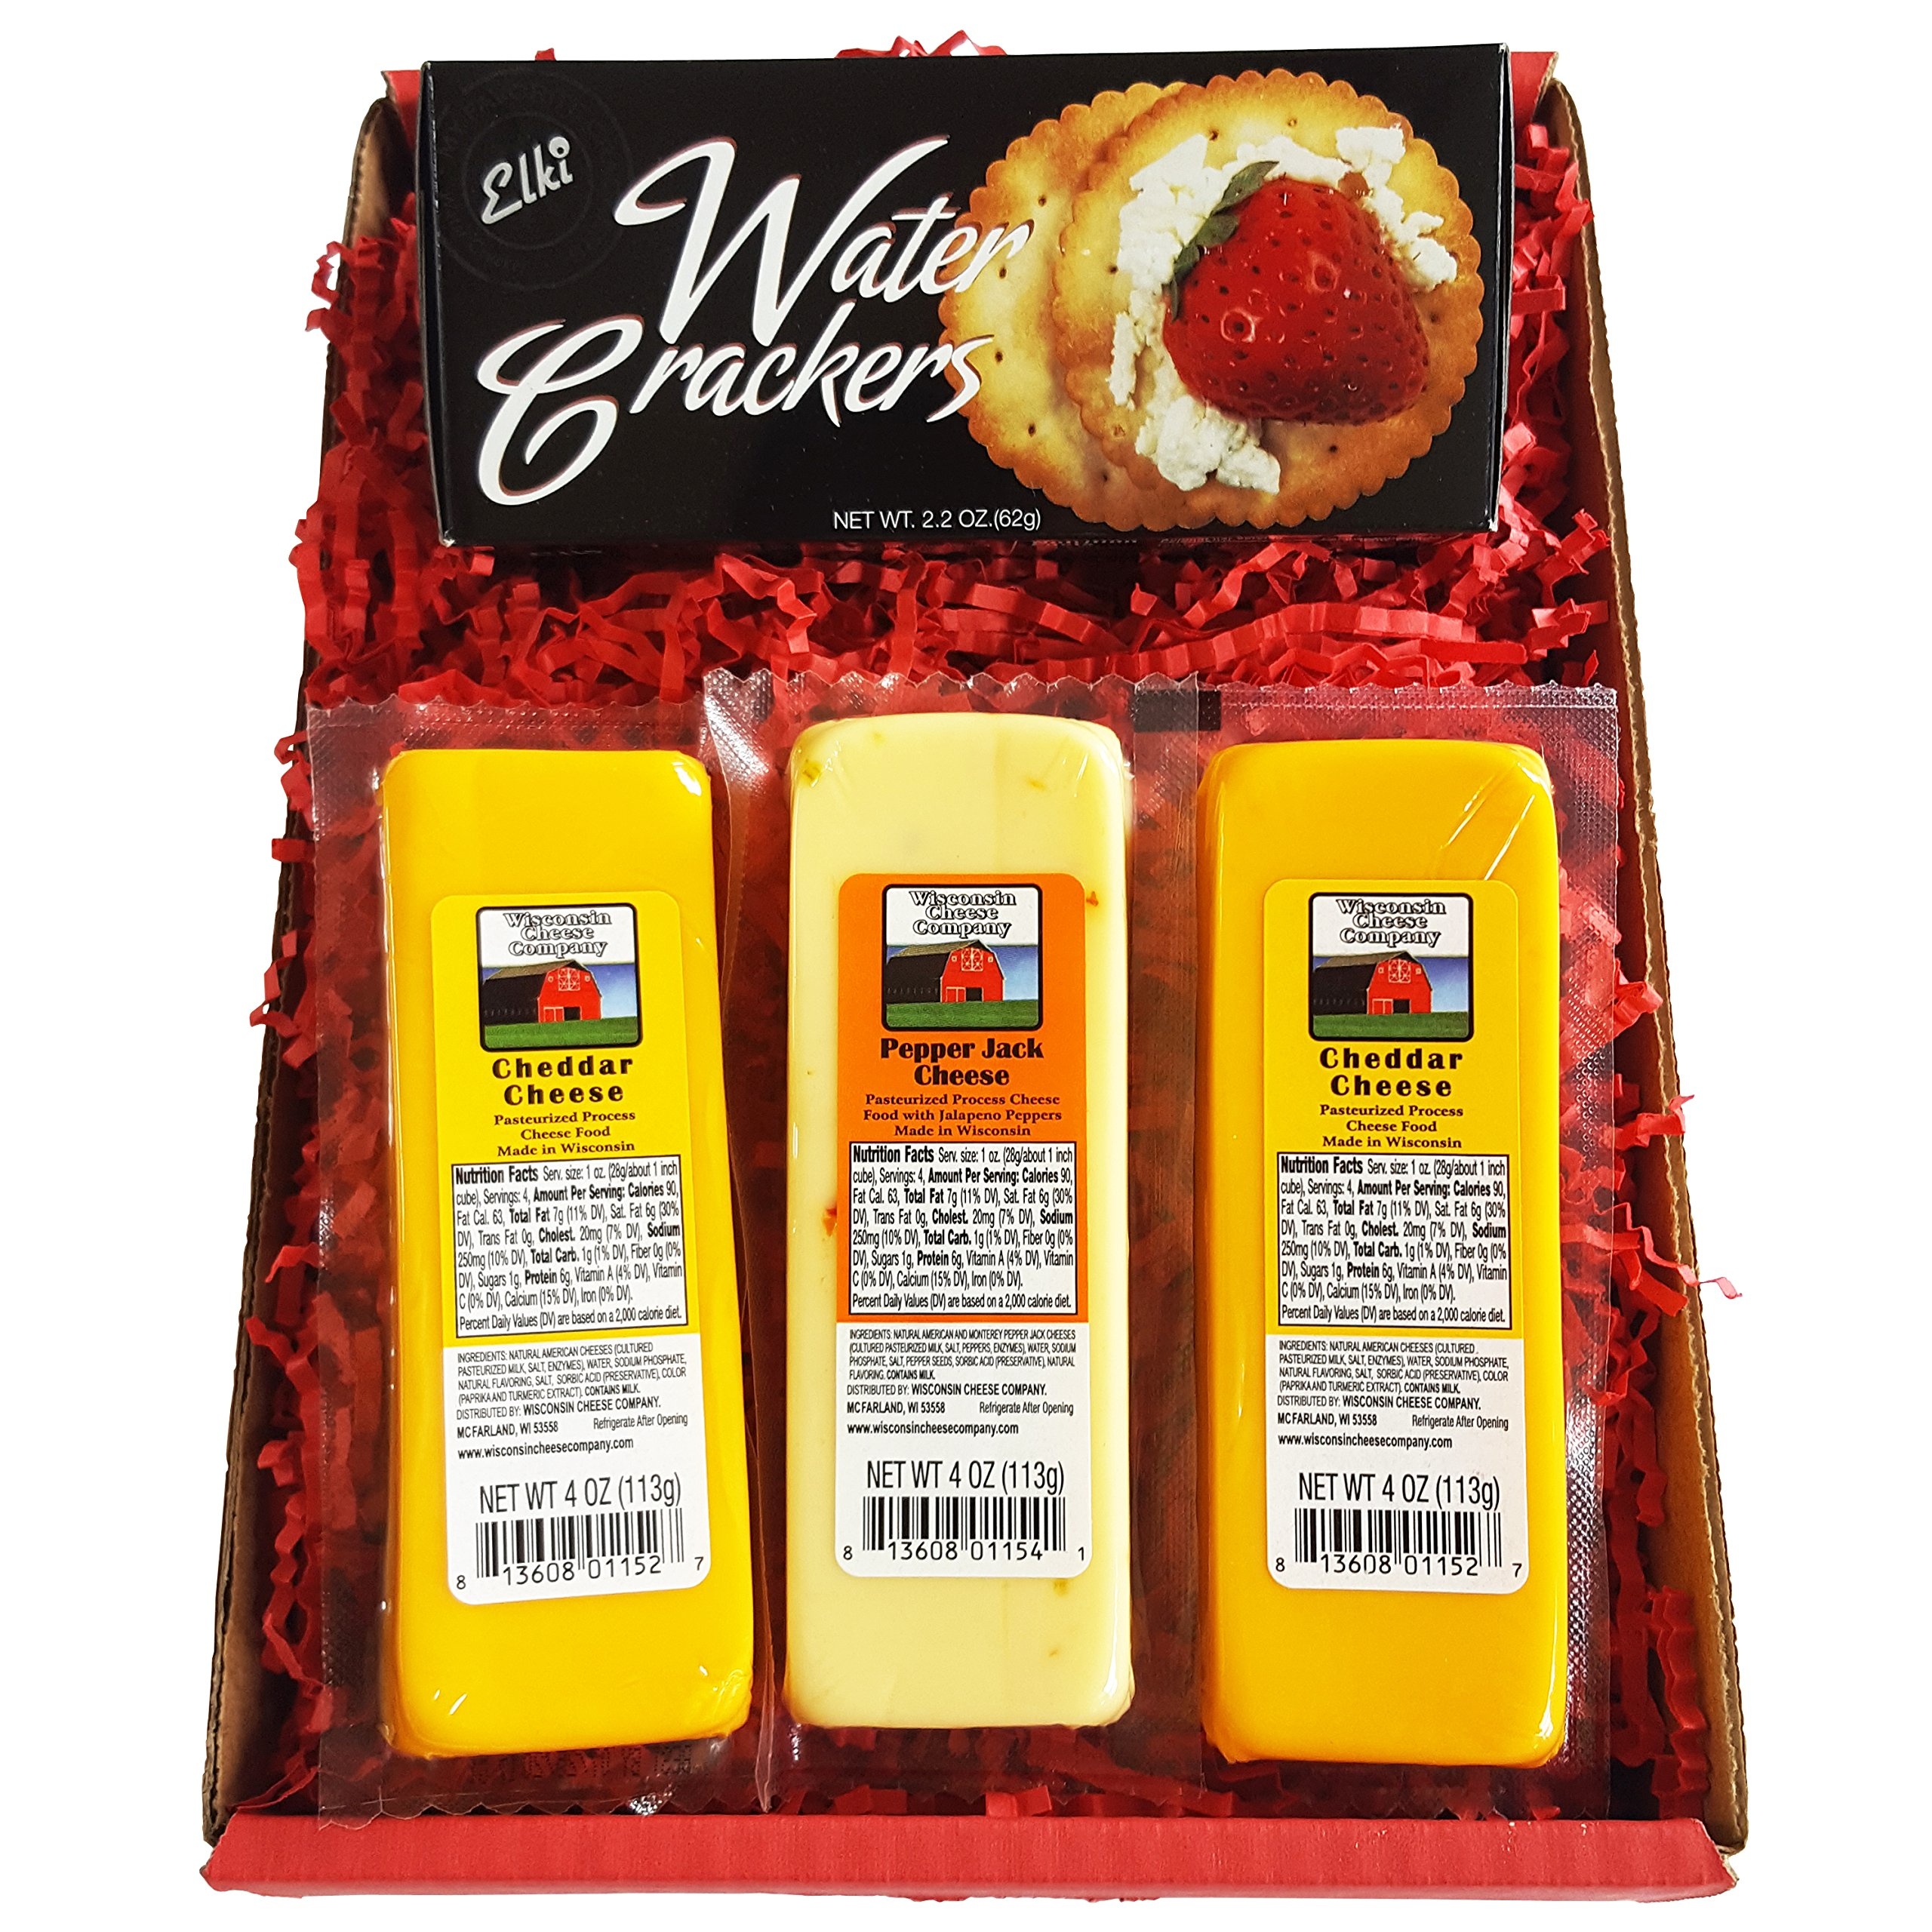 Amazon.com : Wisconsin's Best Smoked Summer Sausage